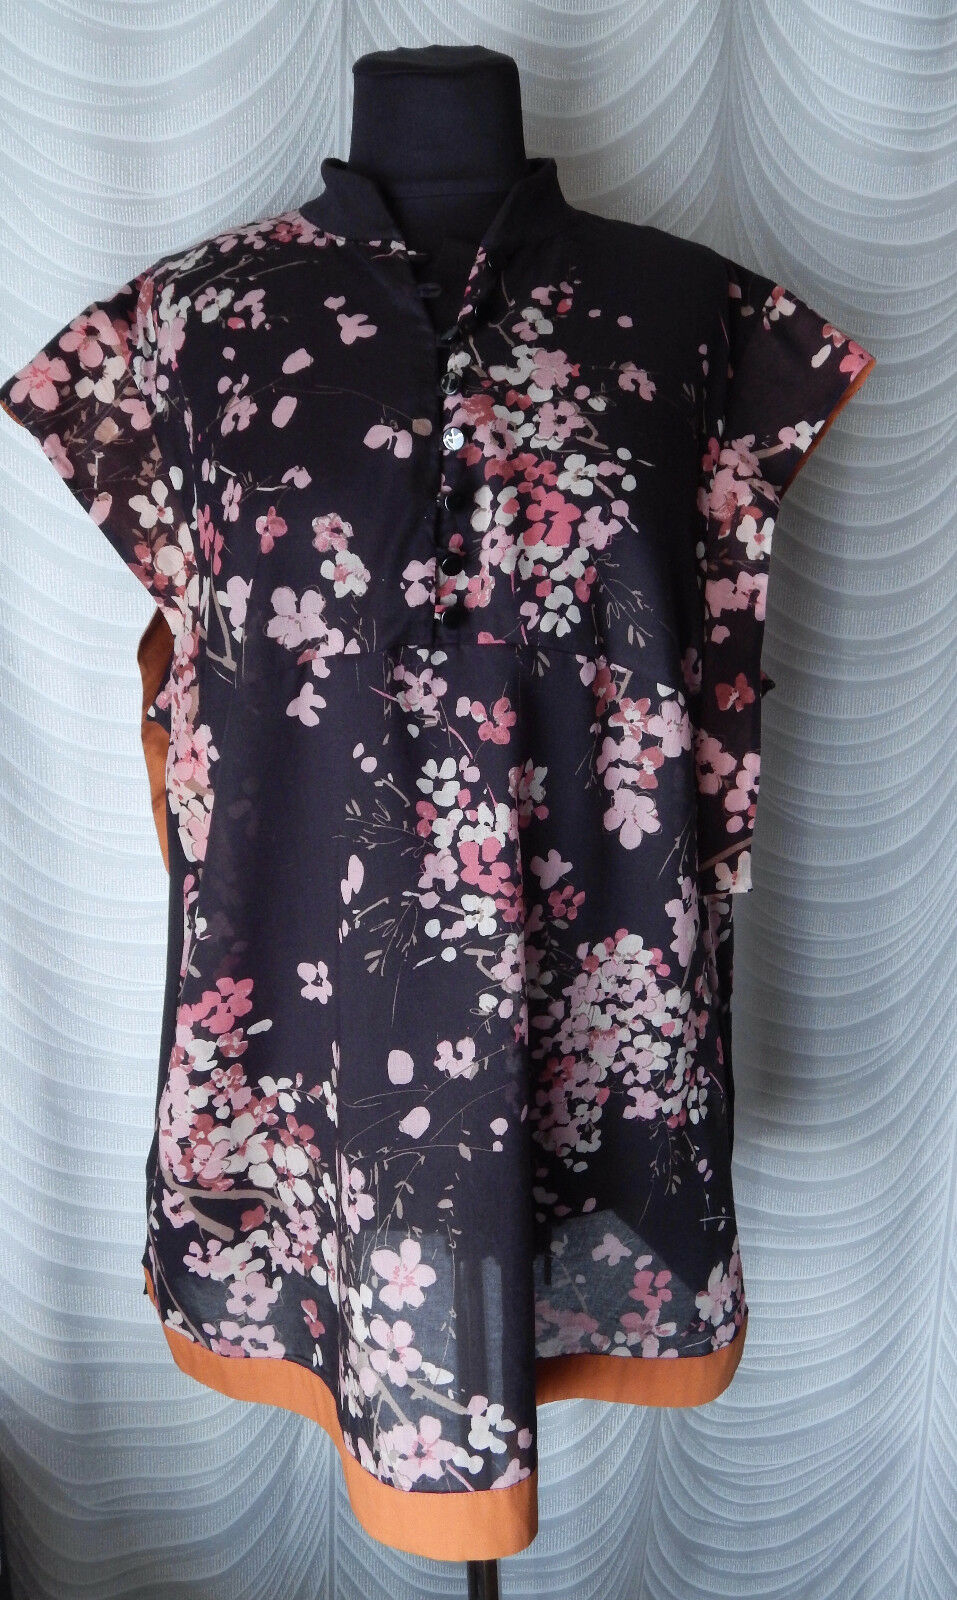 ✔Marina Rinaldi Sport T-Shirt Blouse schwarz Floral Short Sleeve Größe XL